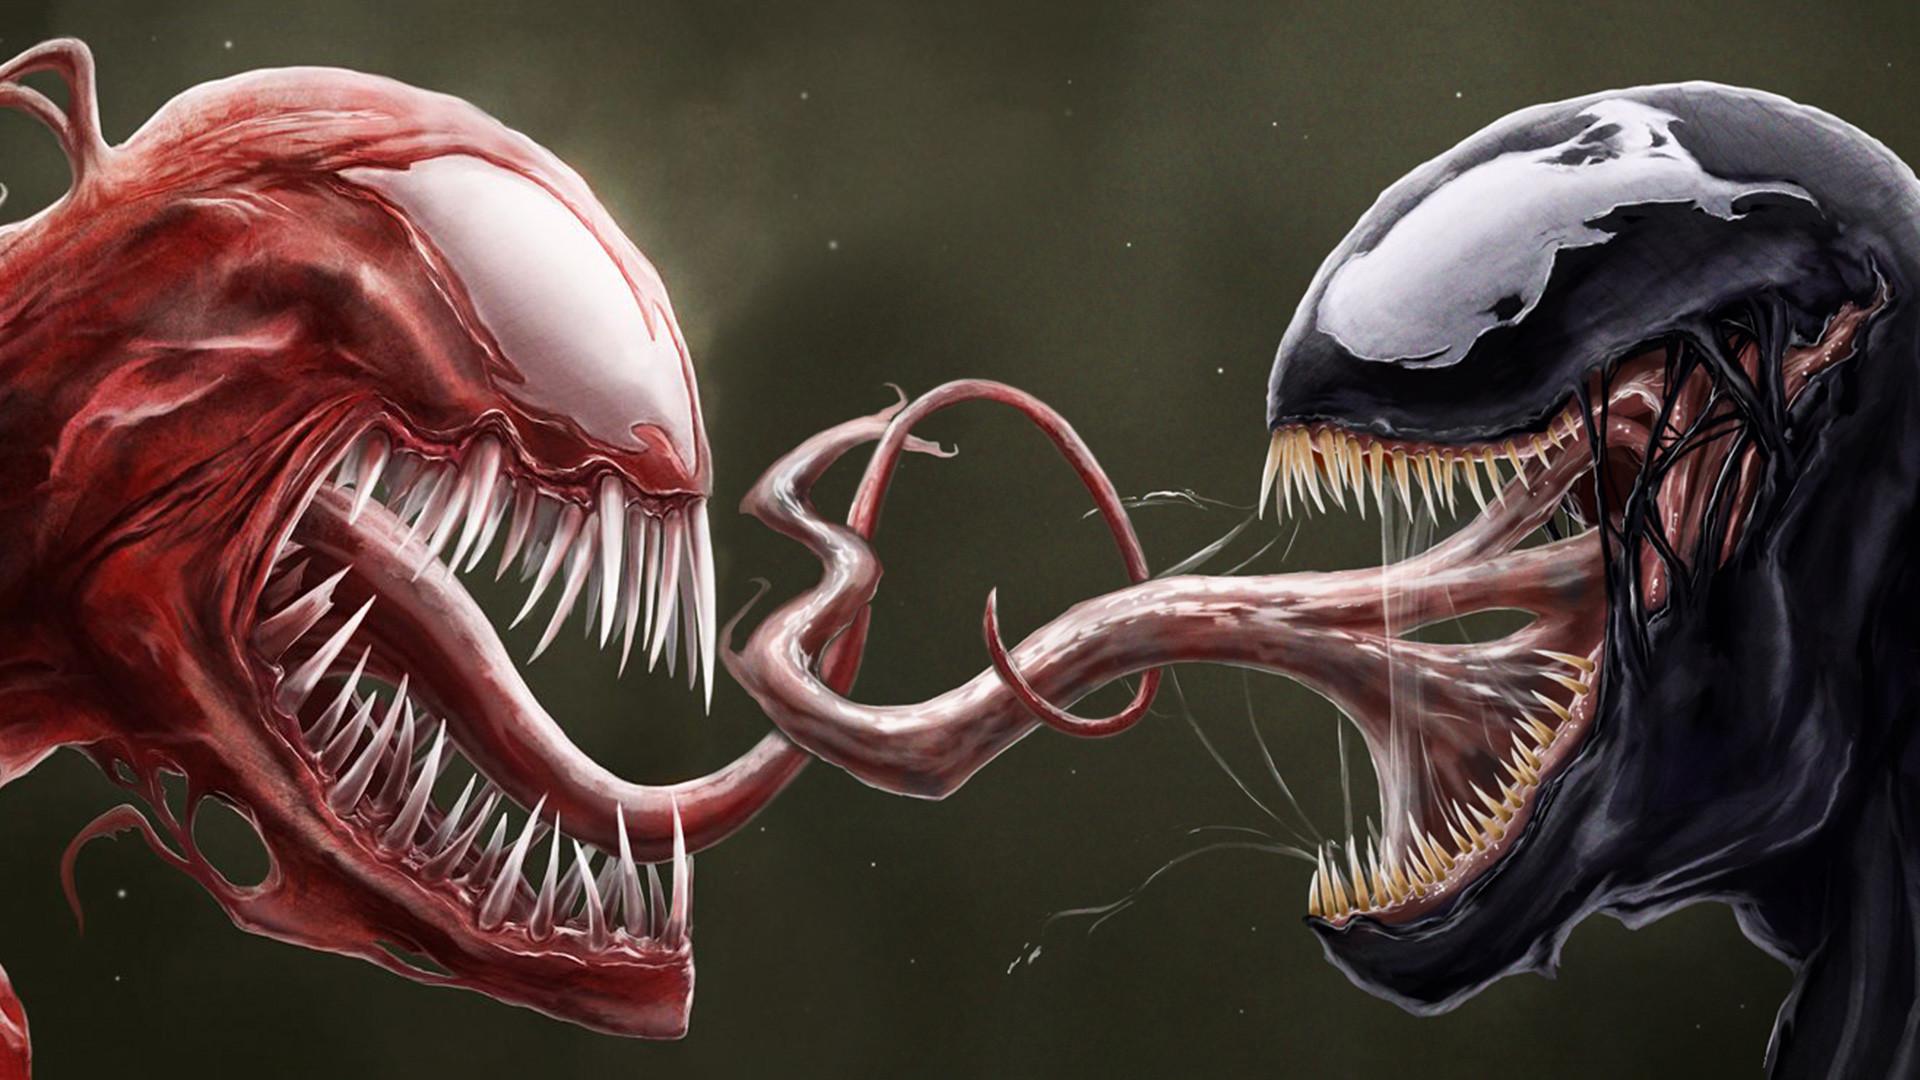 Venom Vs Carnage Wallpaper Background